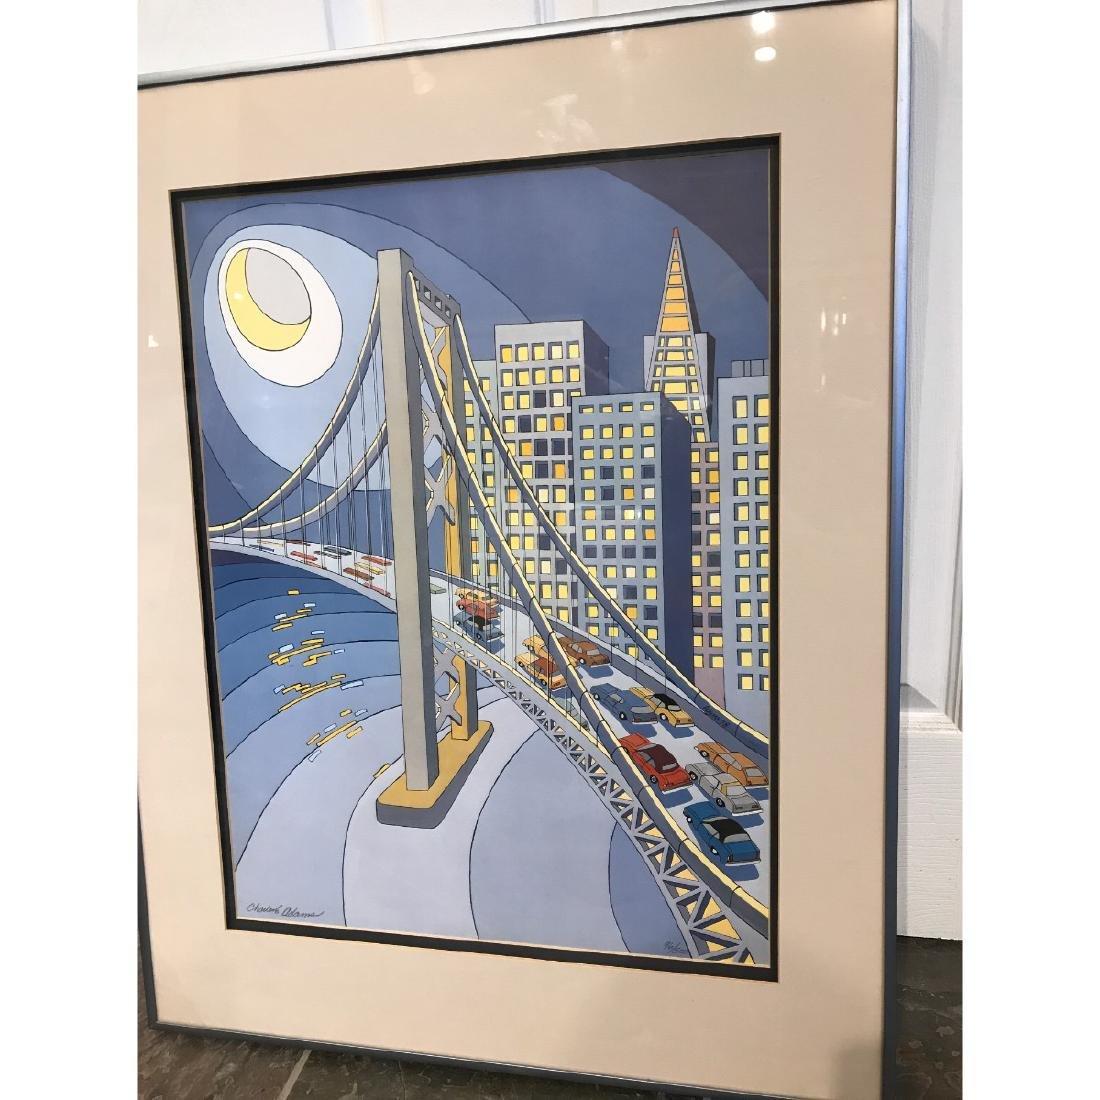 San Francisco Bridge Scene Lmd. Ed. Print by Charles